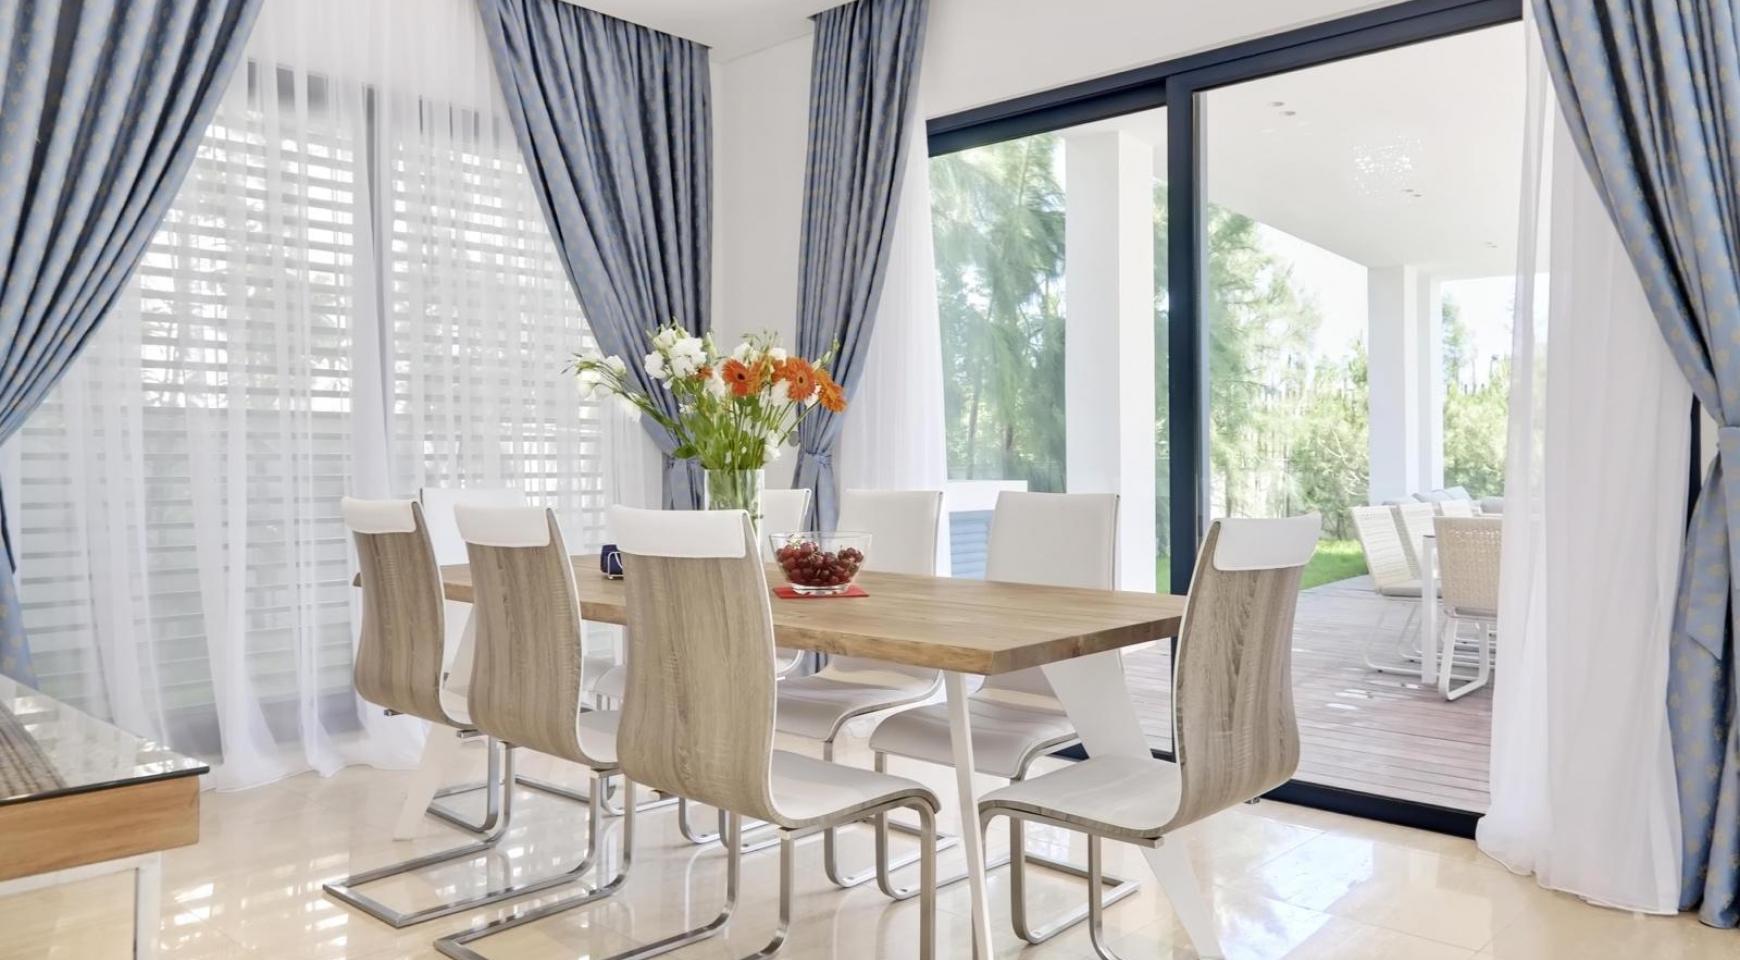 New Luxurious 4 Bedroom Villa in the Tourist Area - 25